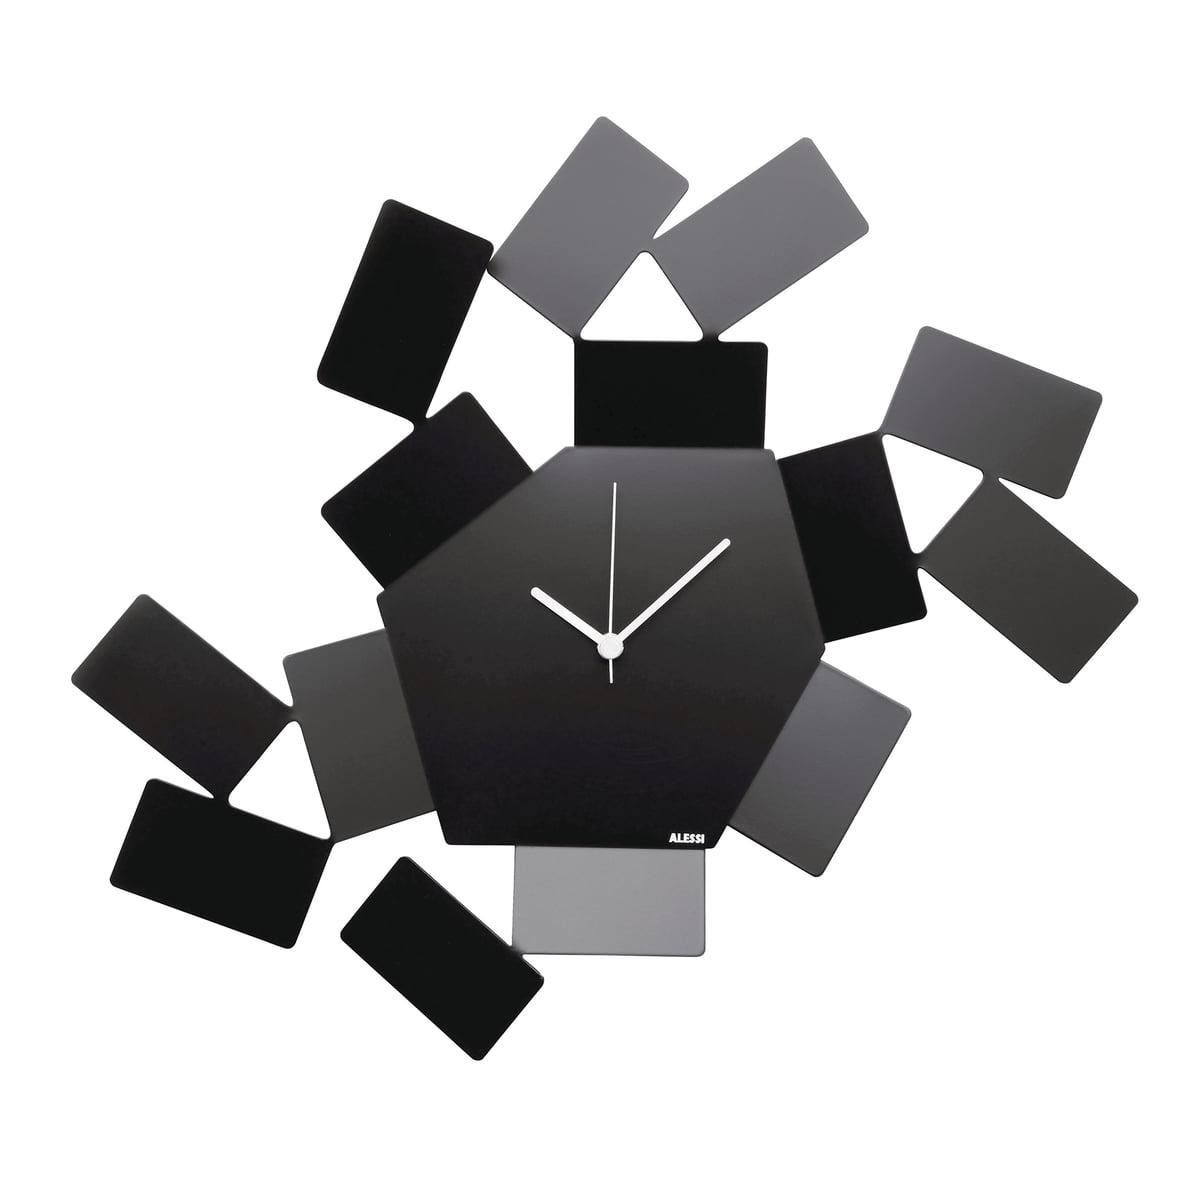 Horloge La Stanza Dello Scirocco Par Alessi